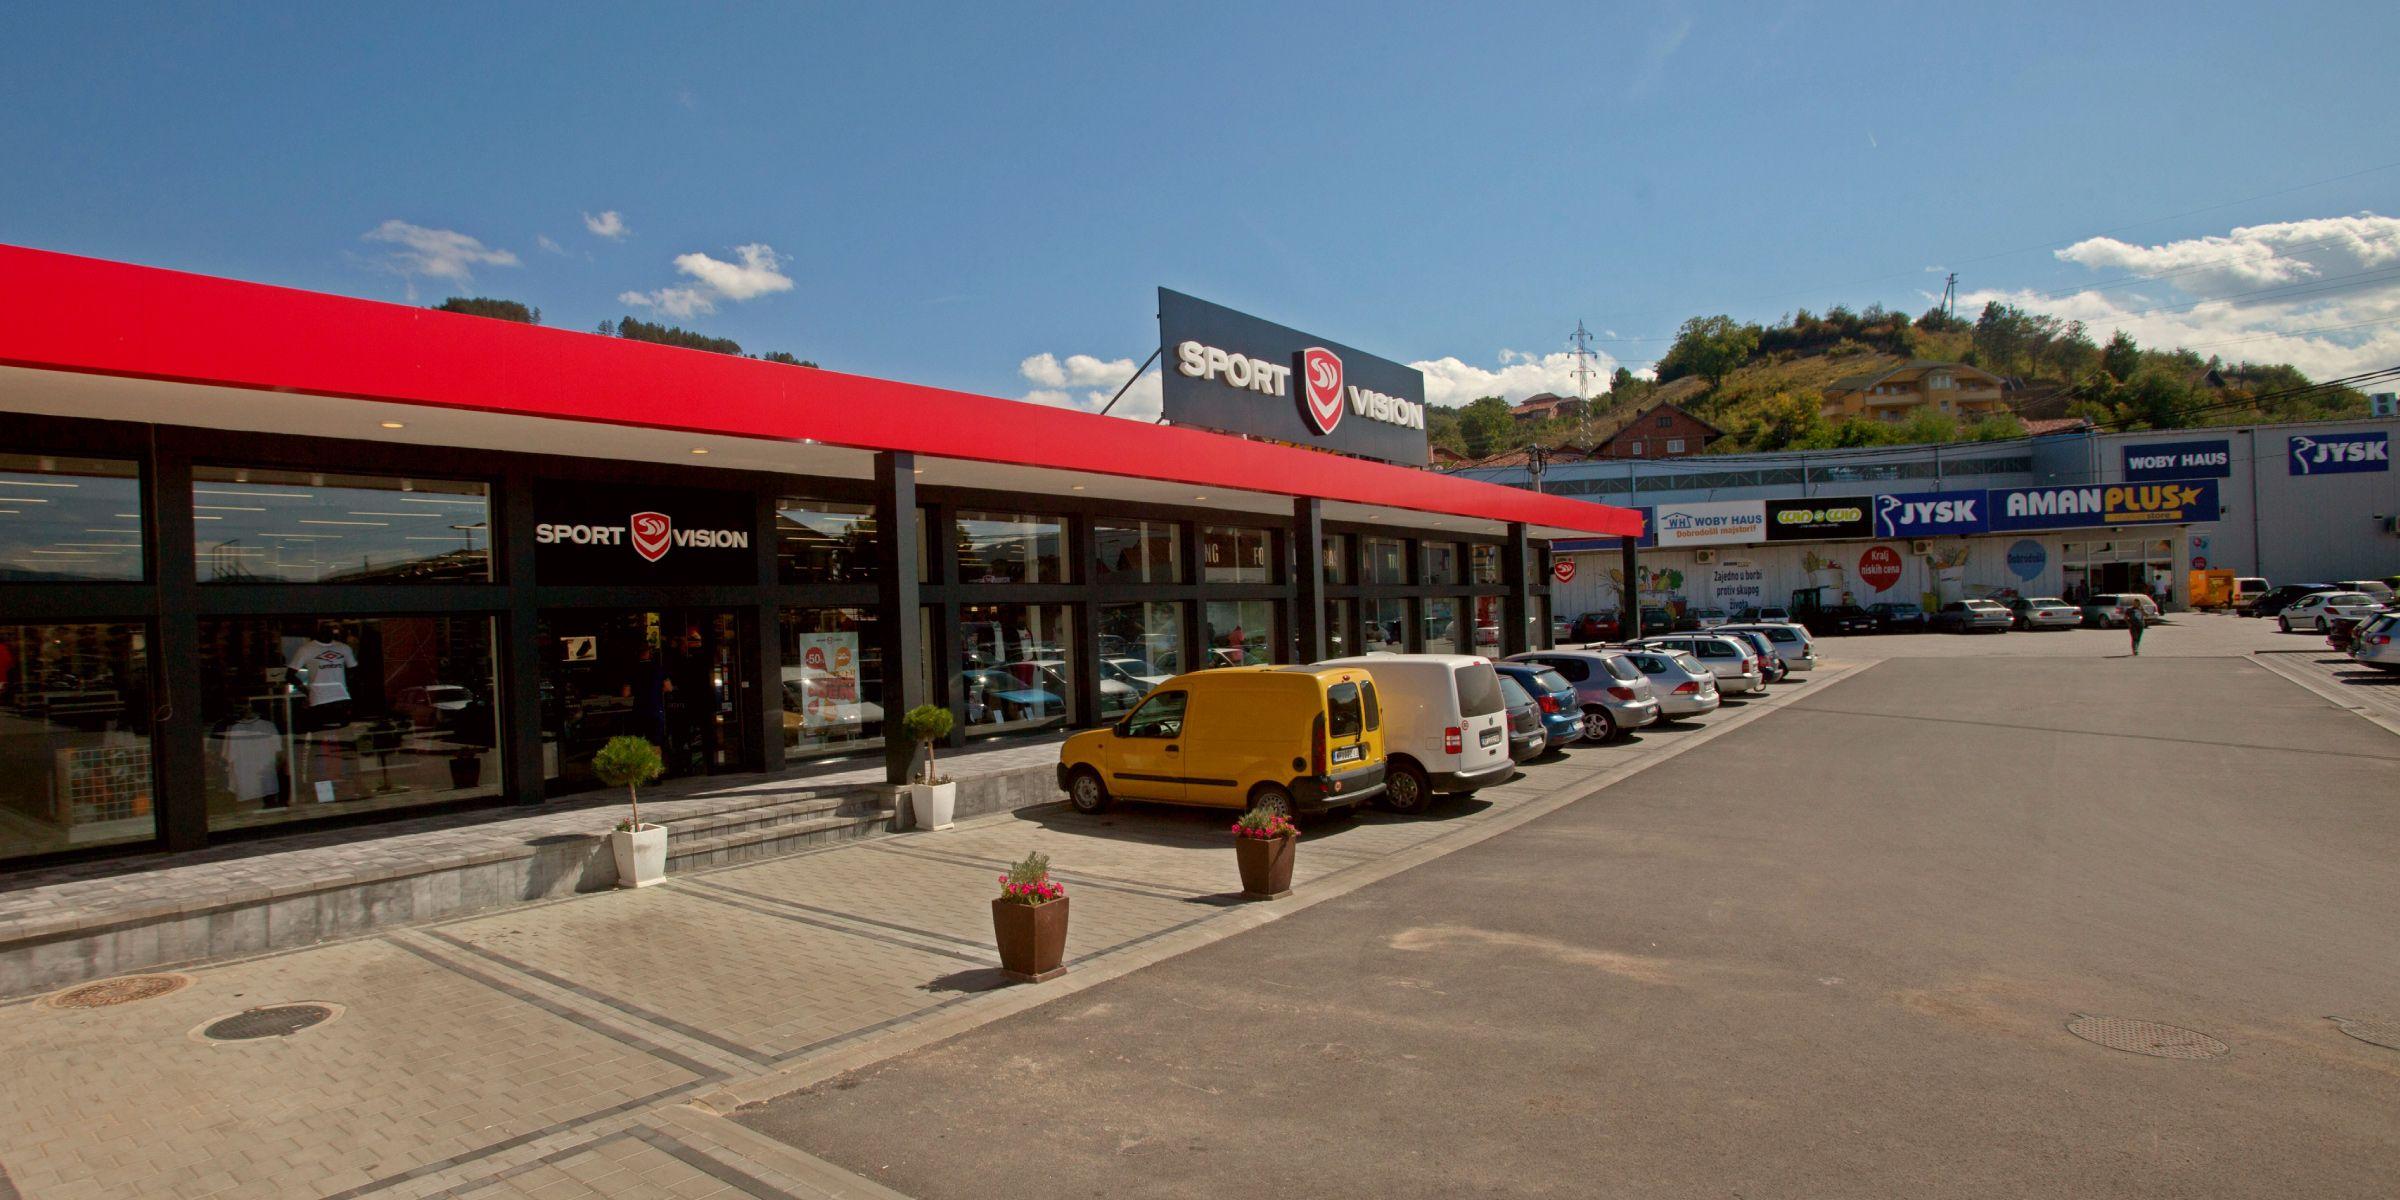 Samald Park šoping centar, Novi Pazar www.novipazarguide